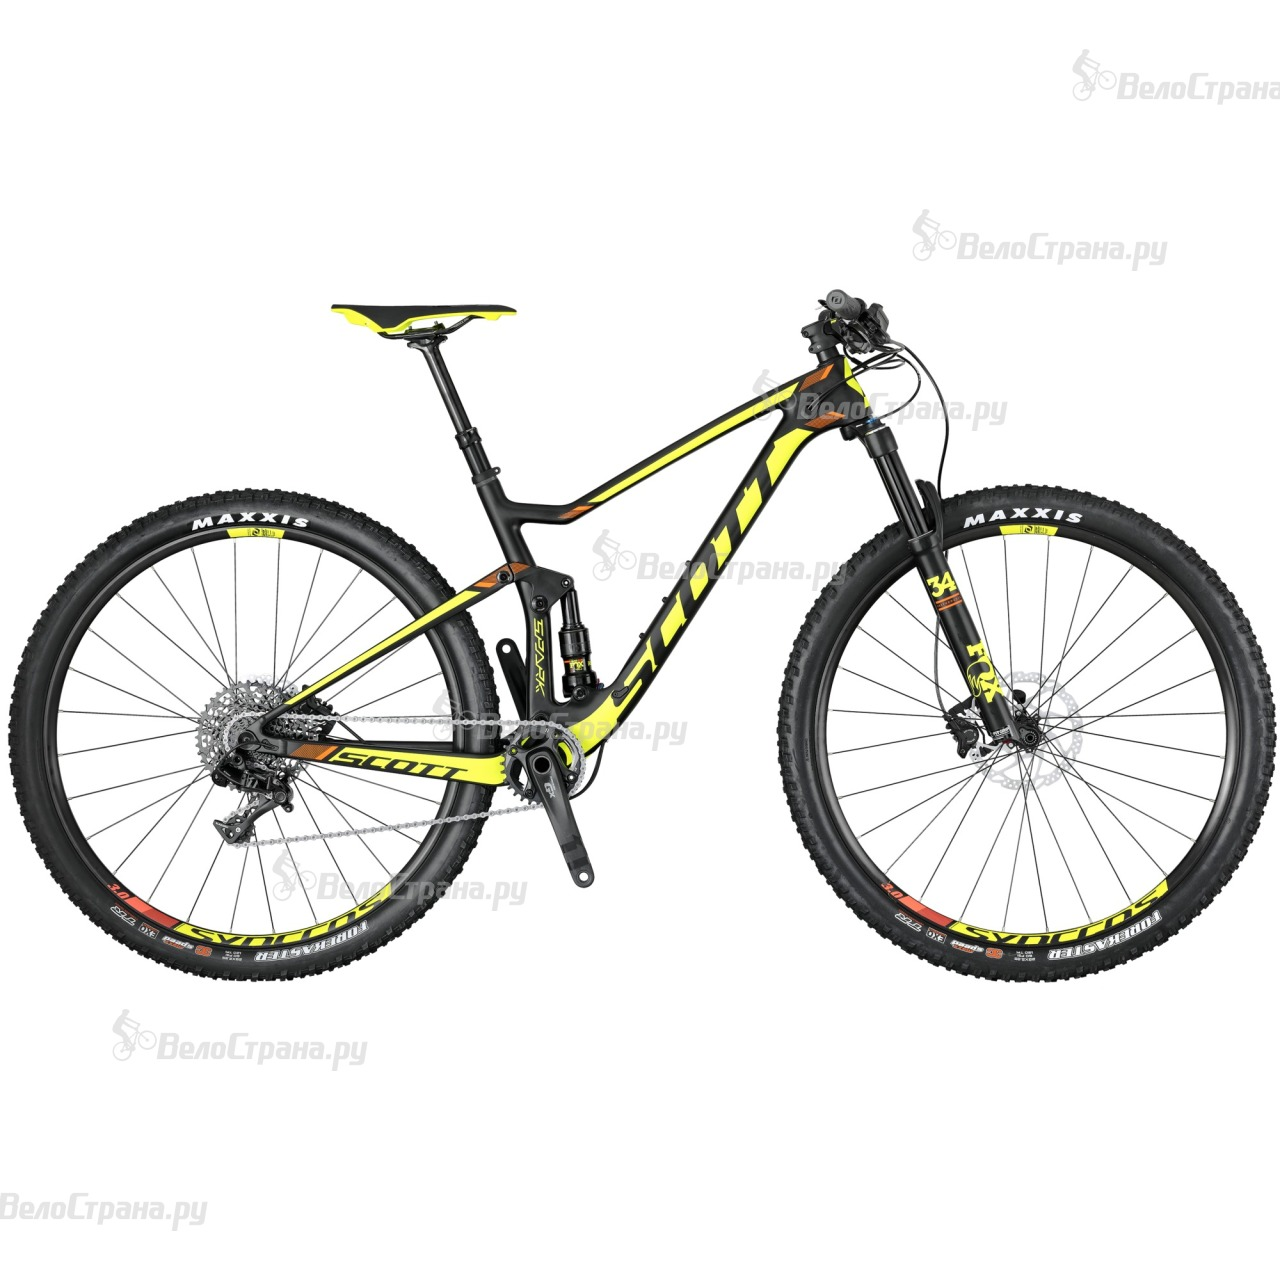 Велосипед Scott Spark 730 (2017) бмв 730 в украине